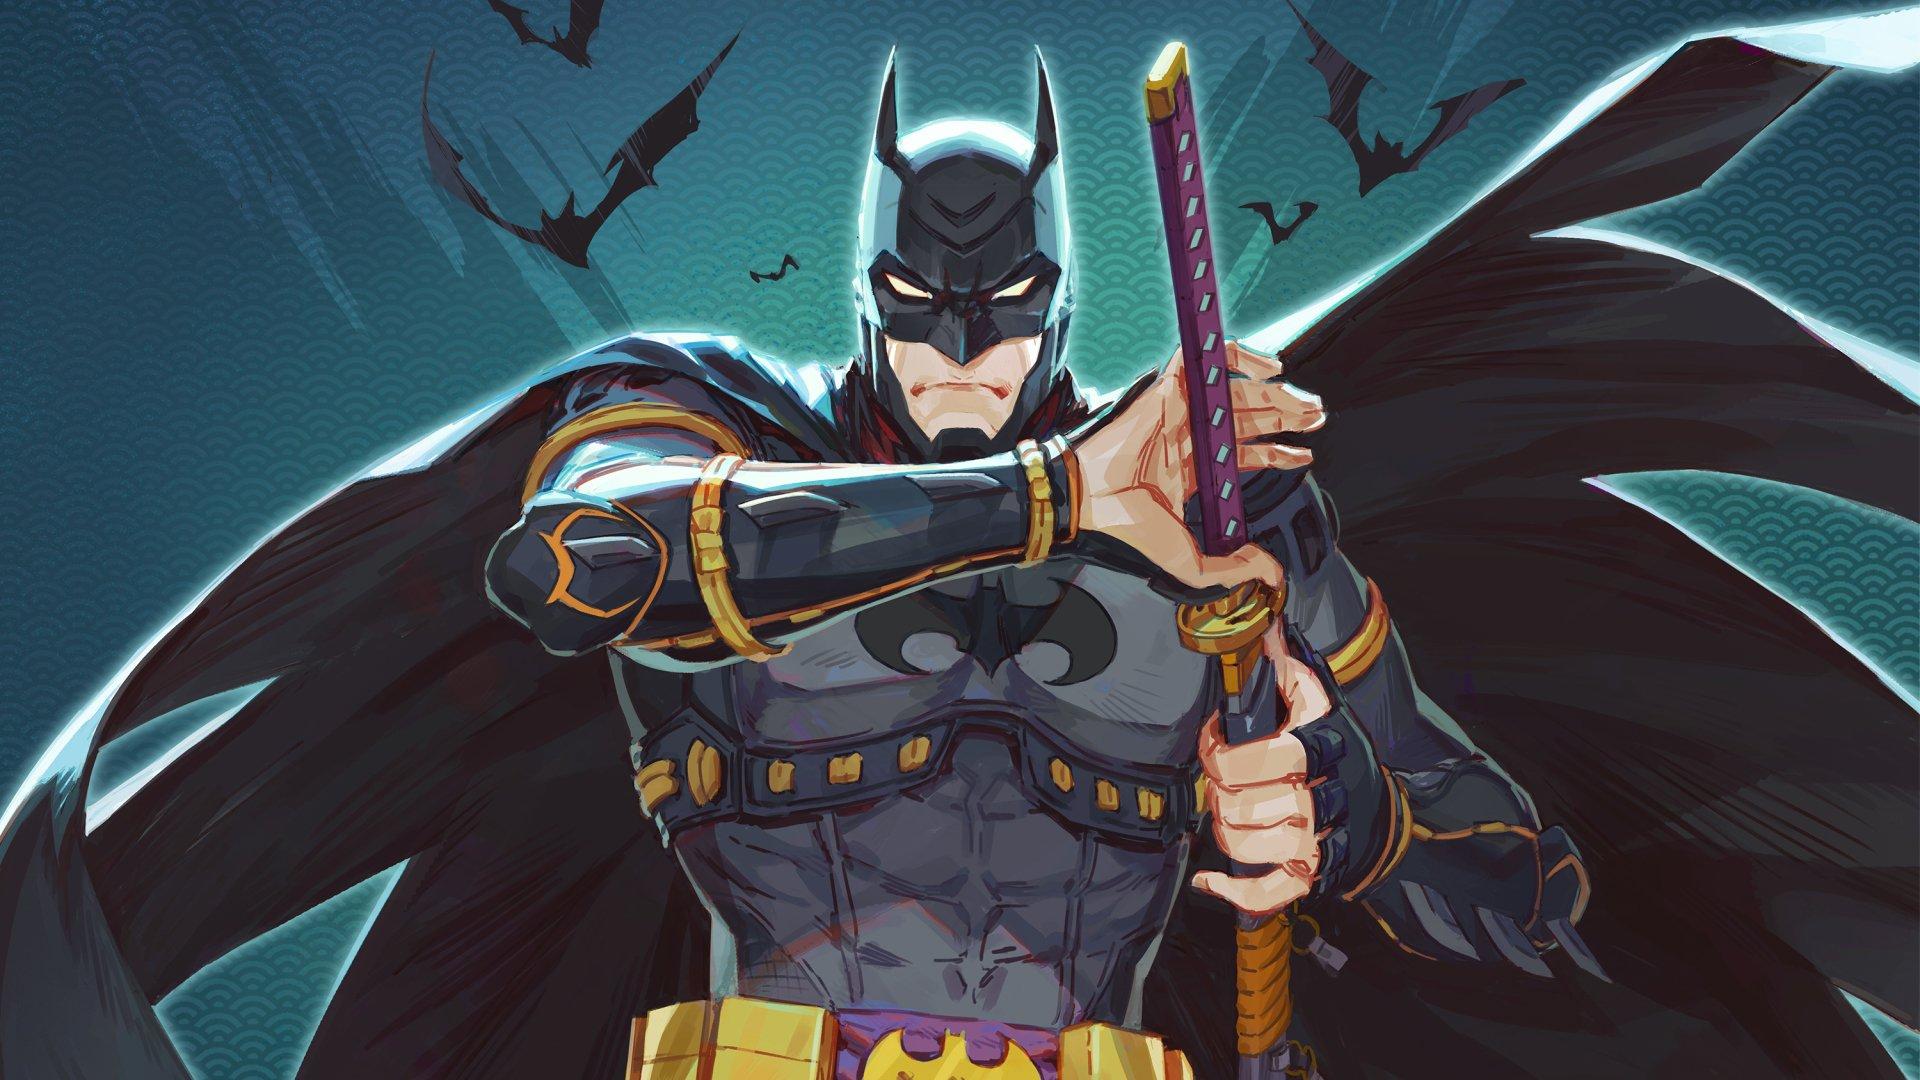 Black Clover's Toonami Finale scheduled for October 9, Batman DC Movies on October 16